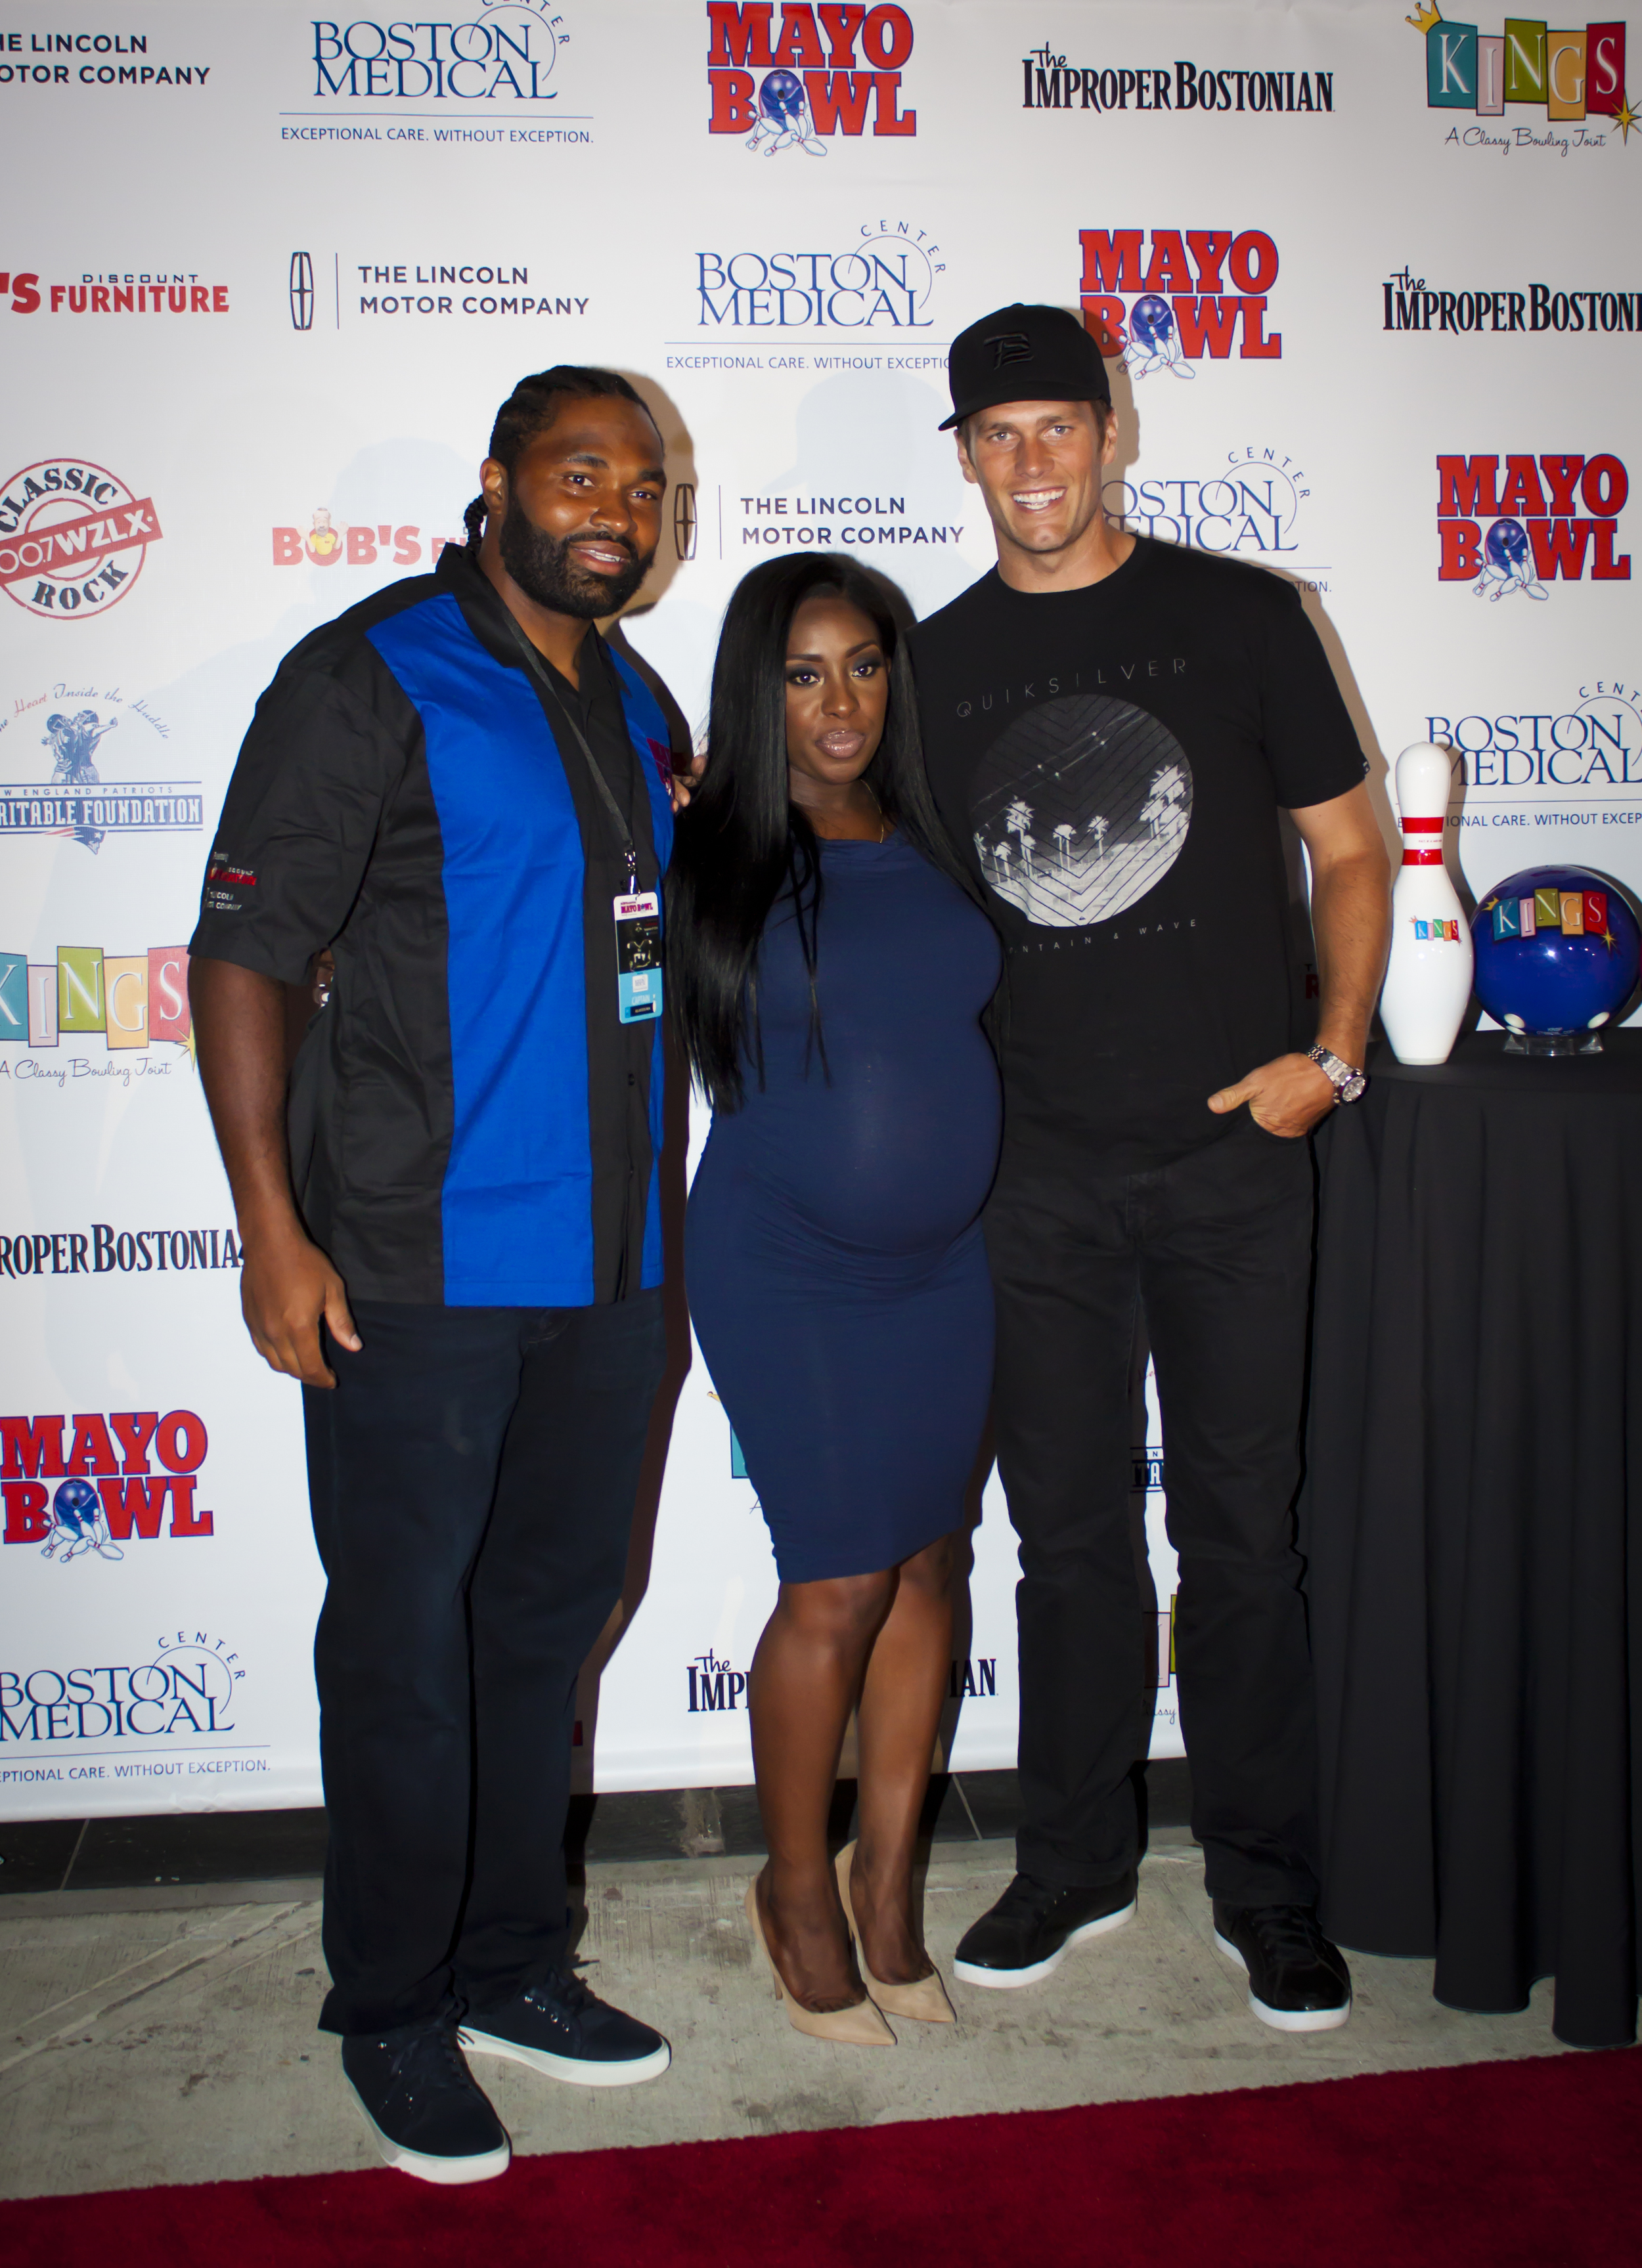 The Mayos and Tom Brady